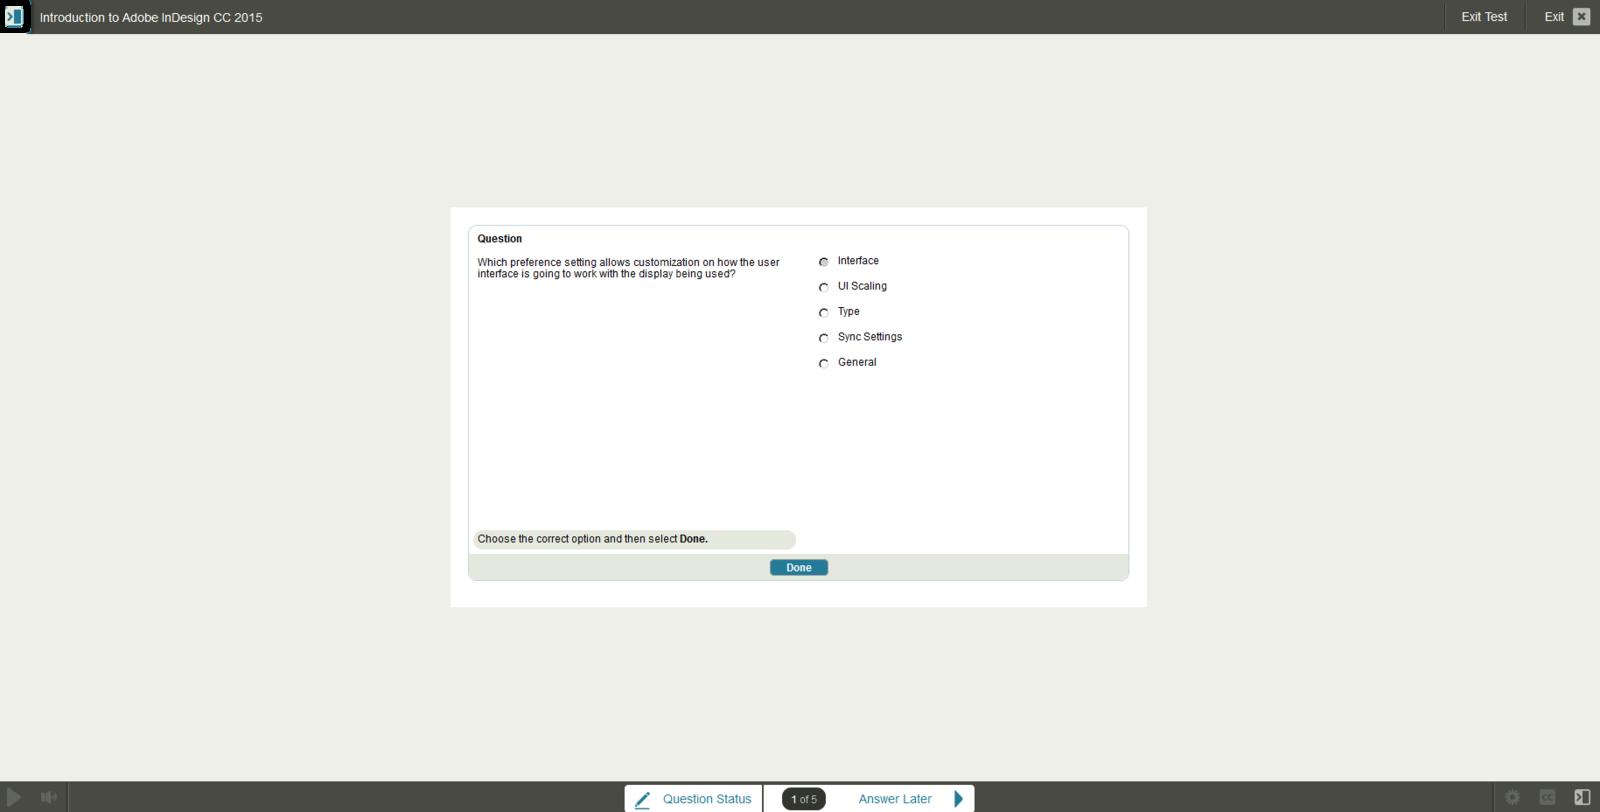 Adobe Adobe InDesign CC 2015 E-Learning Kurs